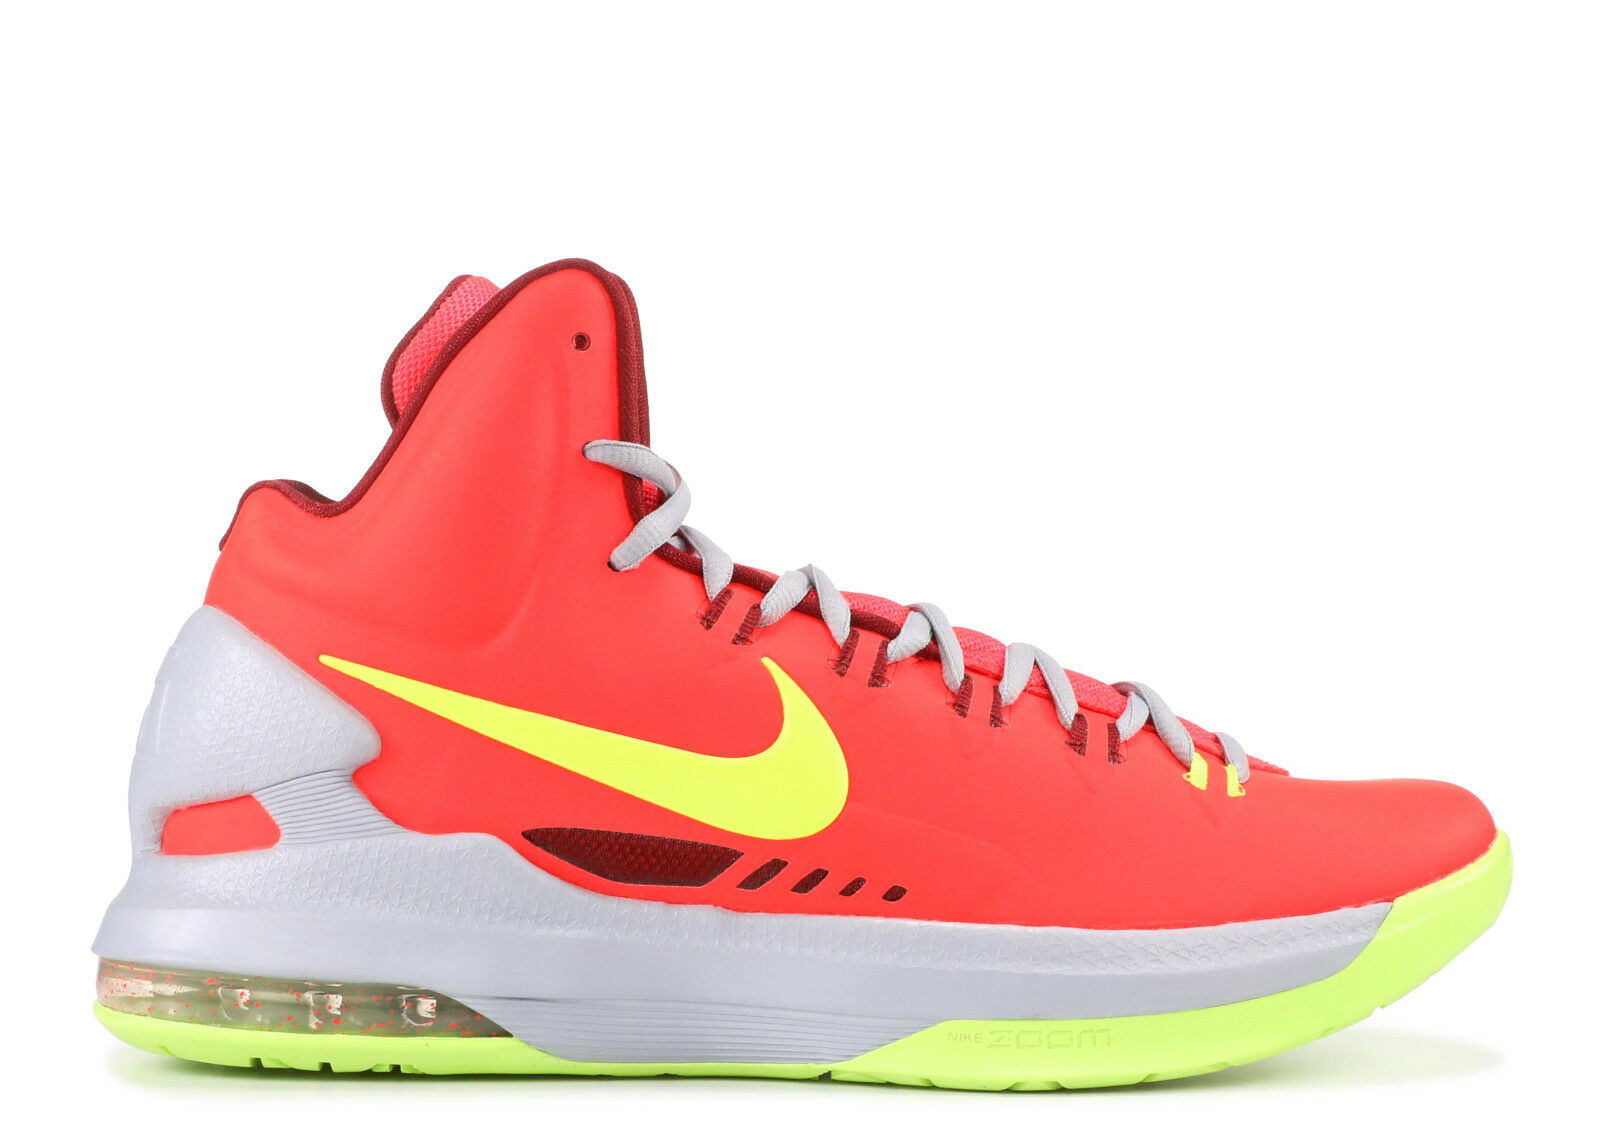 2012 Nike KD V 5 Taille 8.5 Bright Crimson Volt Kevin Durant DMV Elite 554988-610